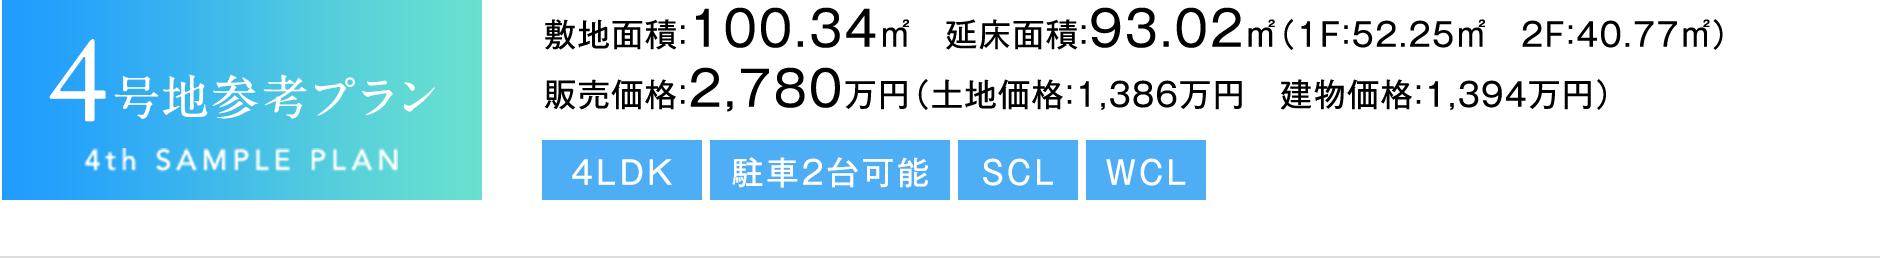 4号地参考プラン 4LDK 駐車2台可能 SCL WCL